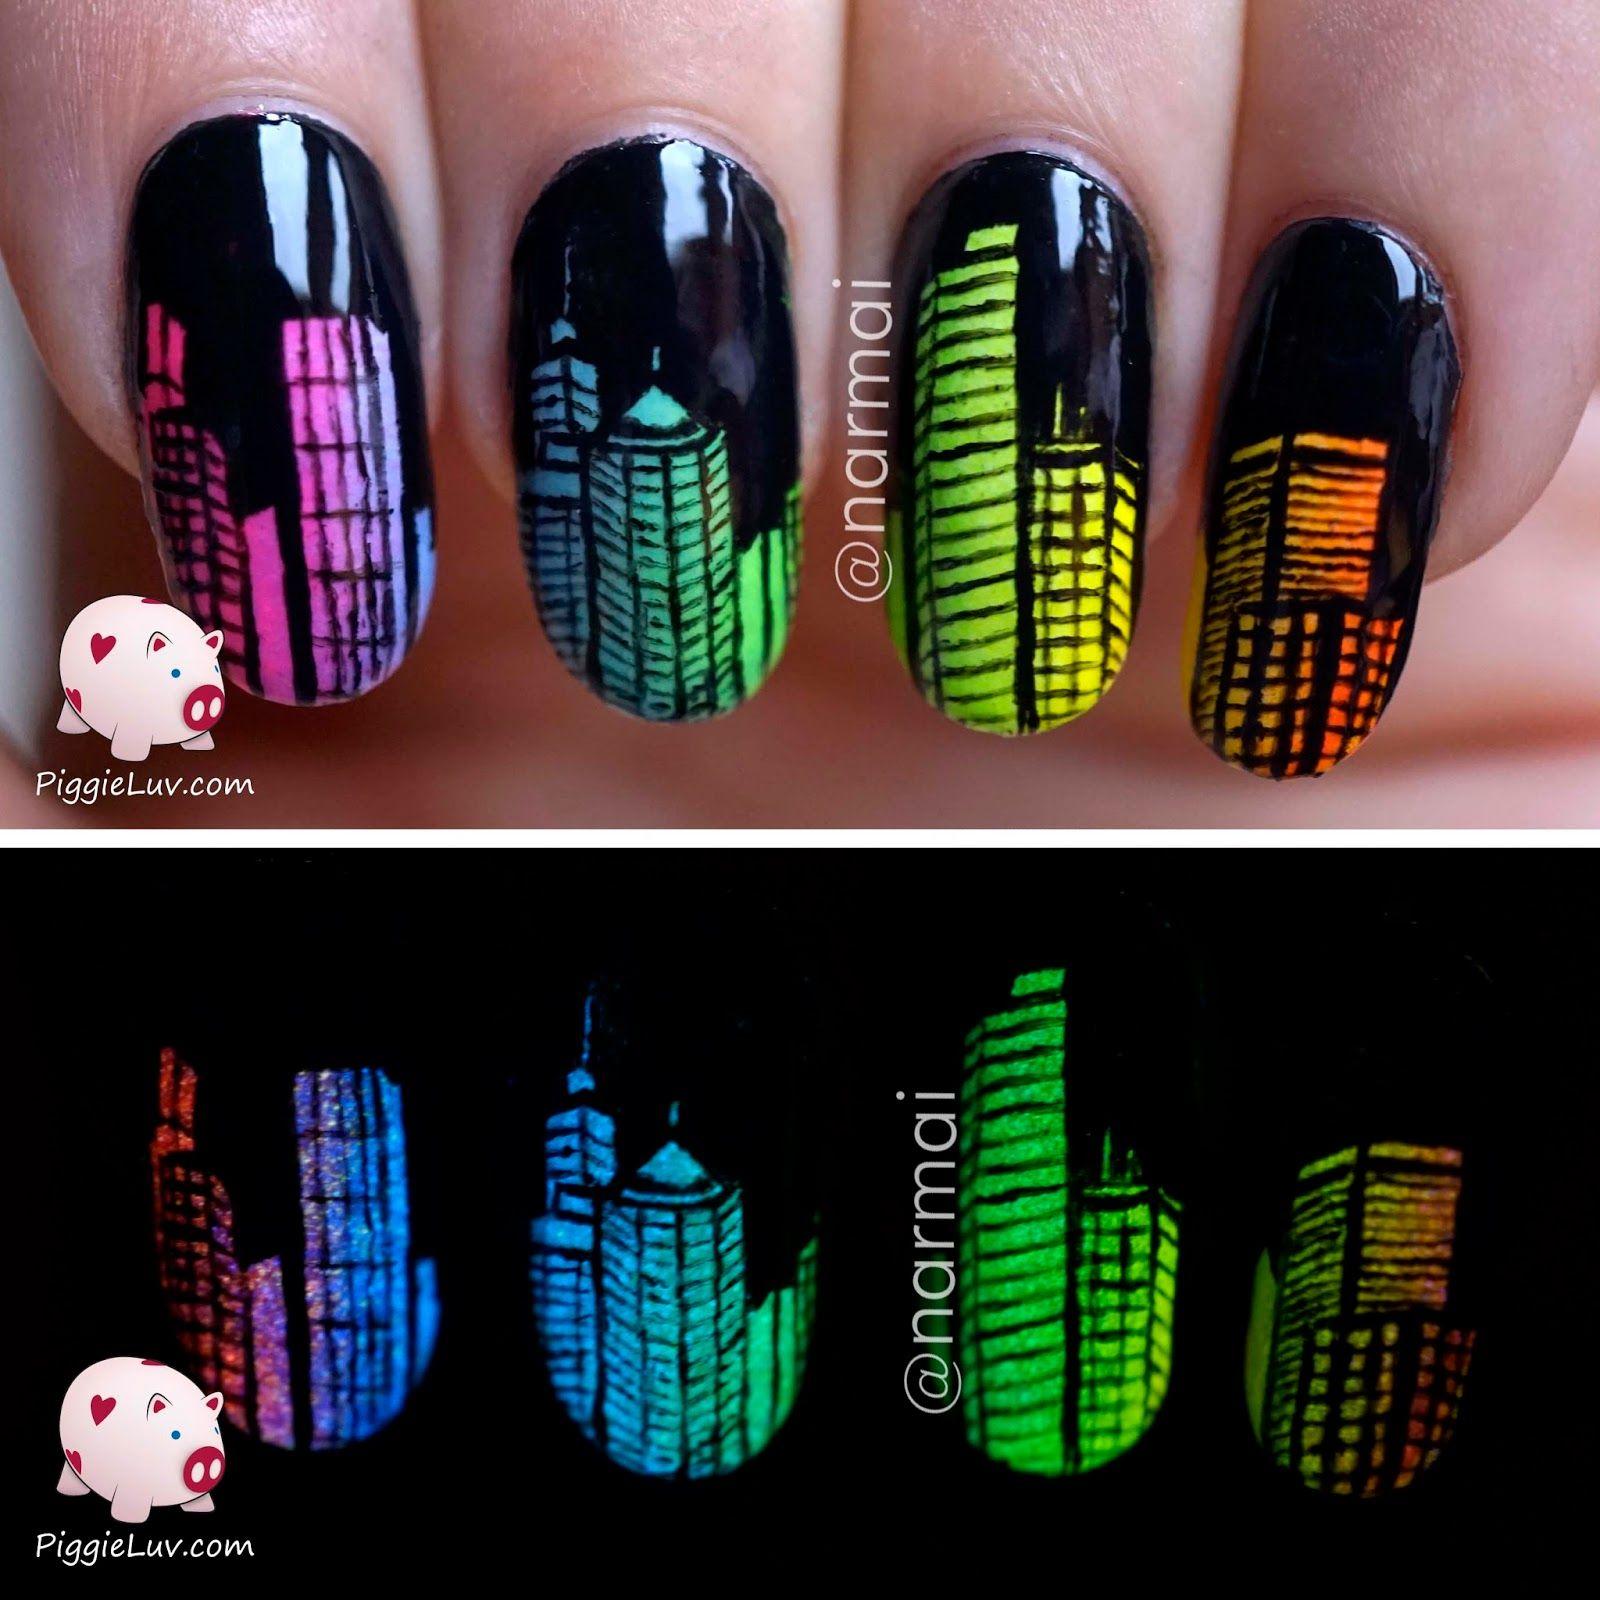 Glow in the dark city skyline nail art | Glow nails, Nail ...